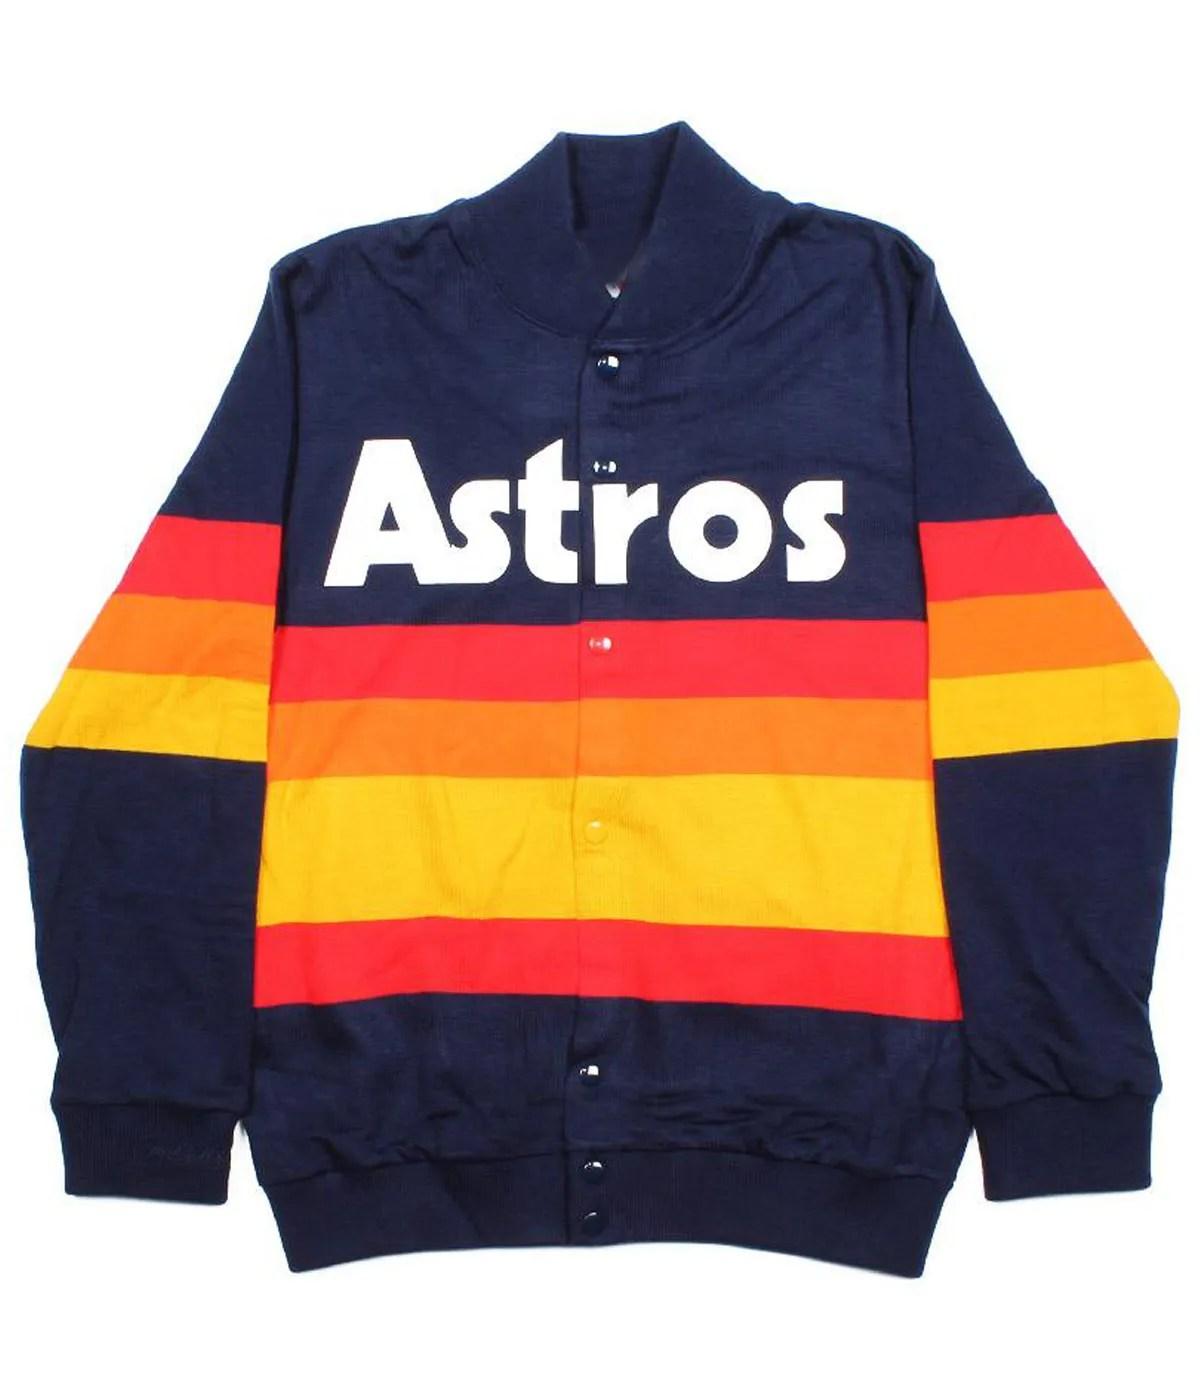 astros-cardigan-sweater